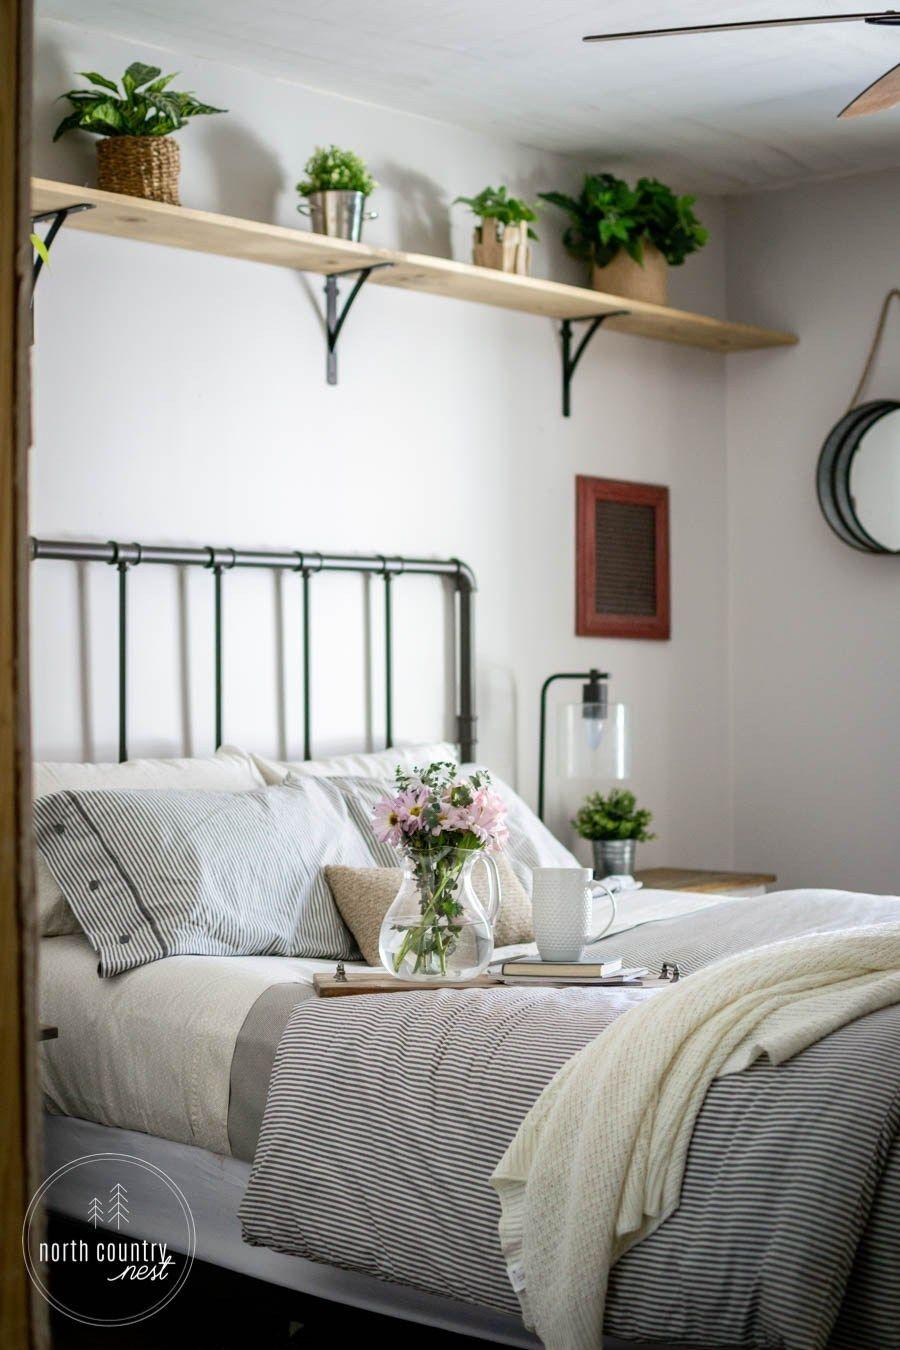 Simple Spring Decor For The Guest Bedroom Farmhouse Decor